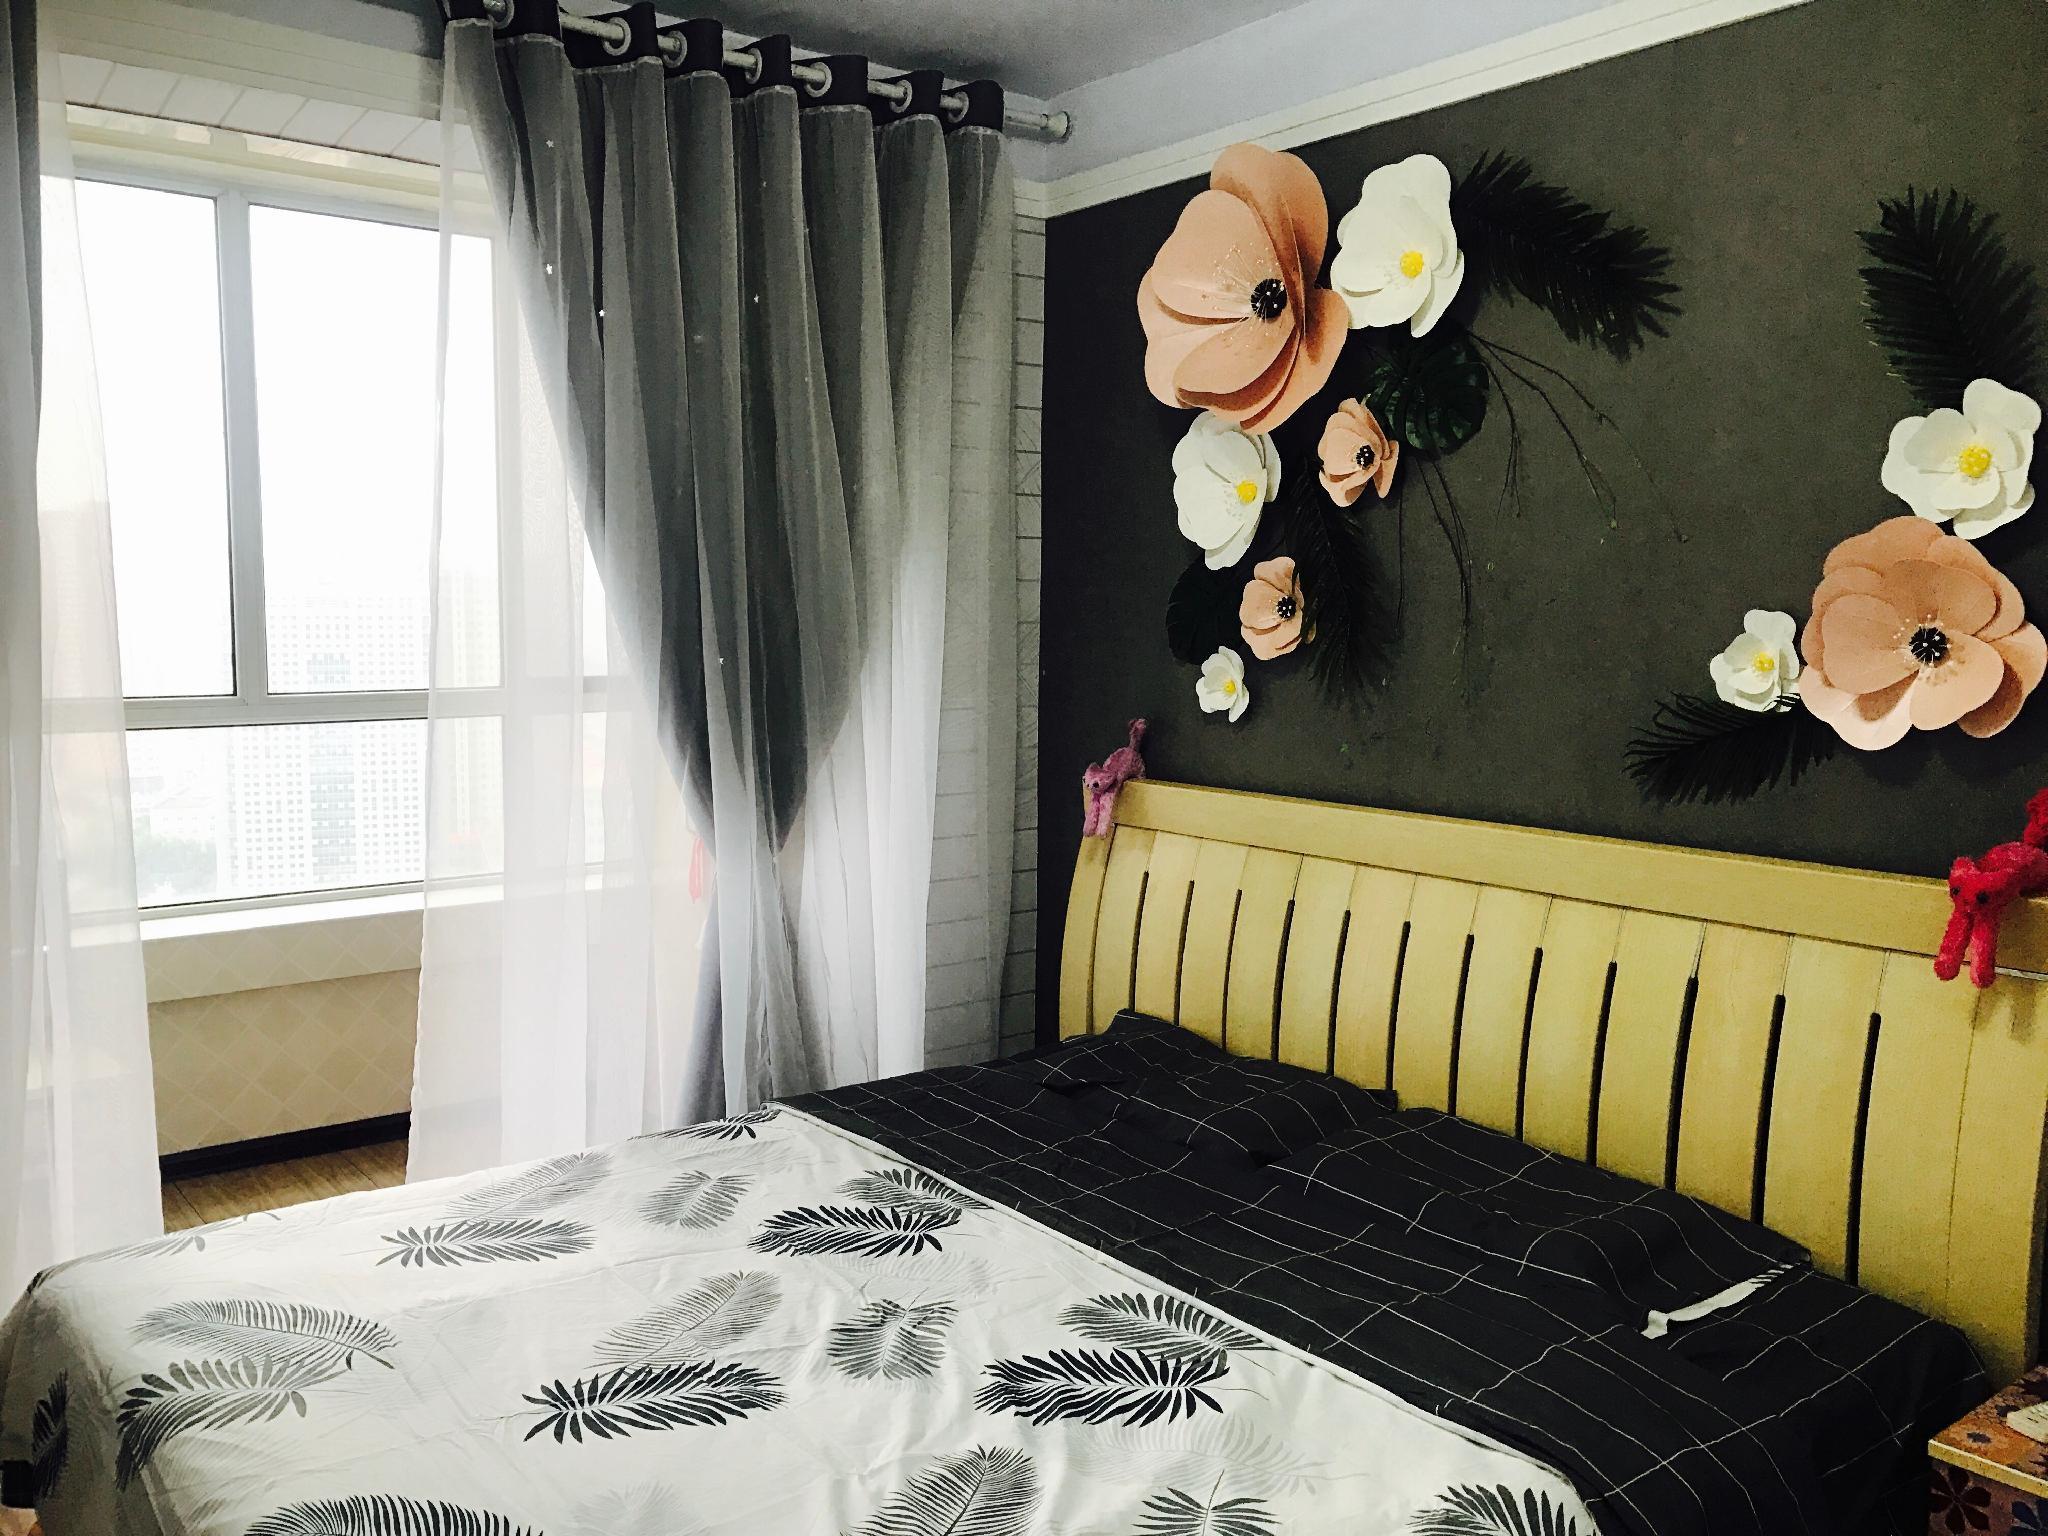 Reviews Chengde American Jane ou warm home